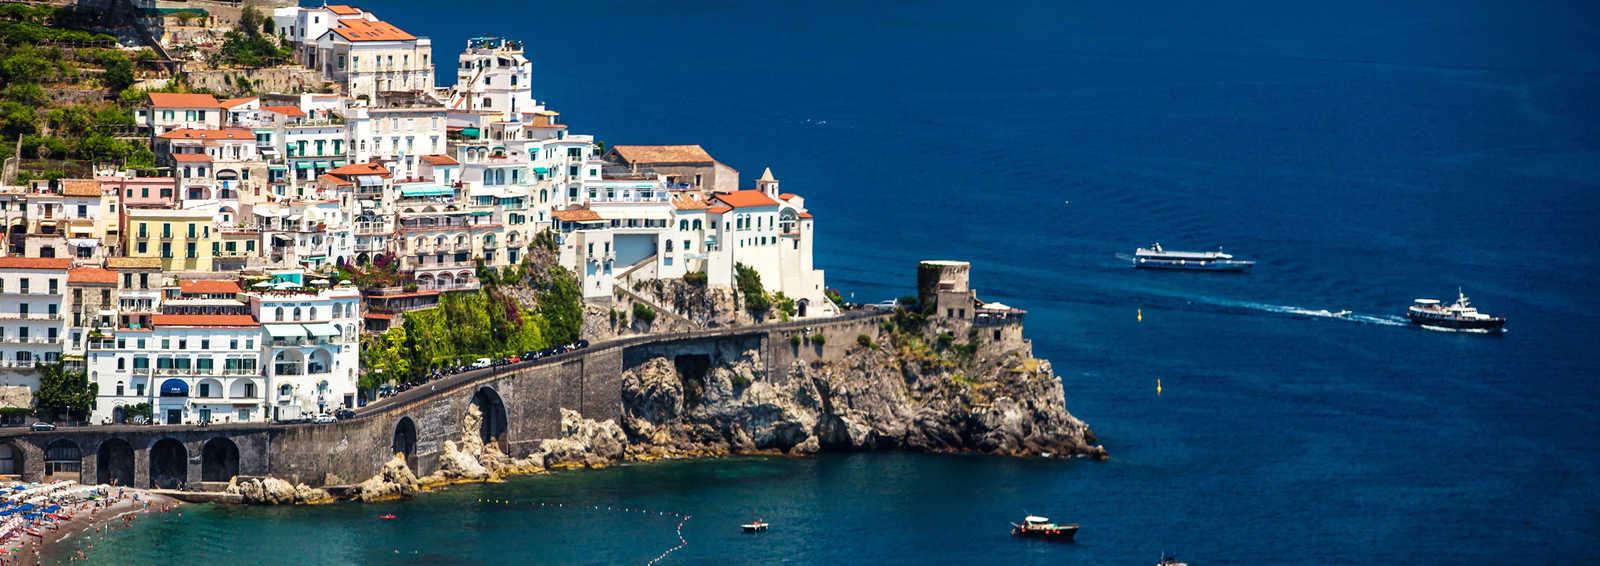 Win a trip to the Amalfi Coast